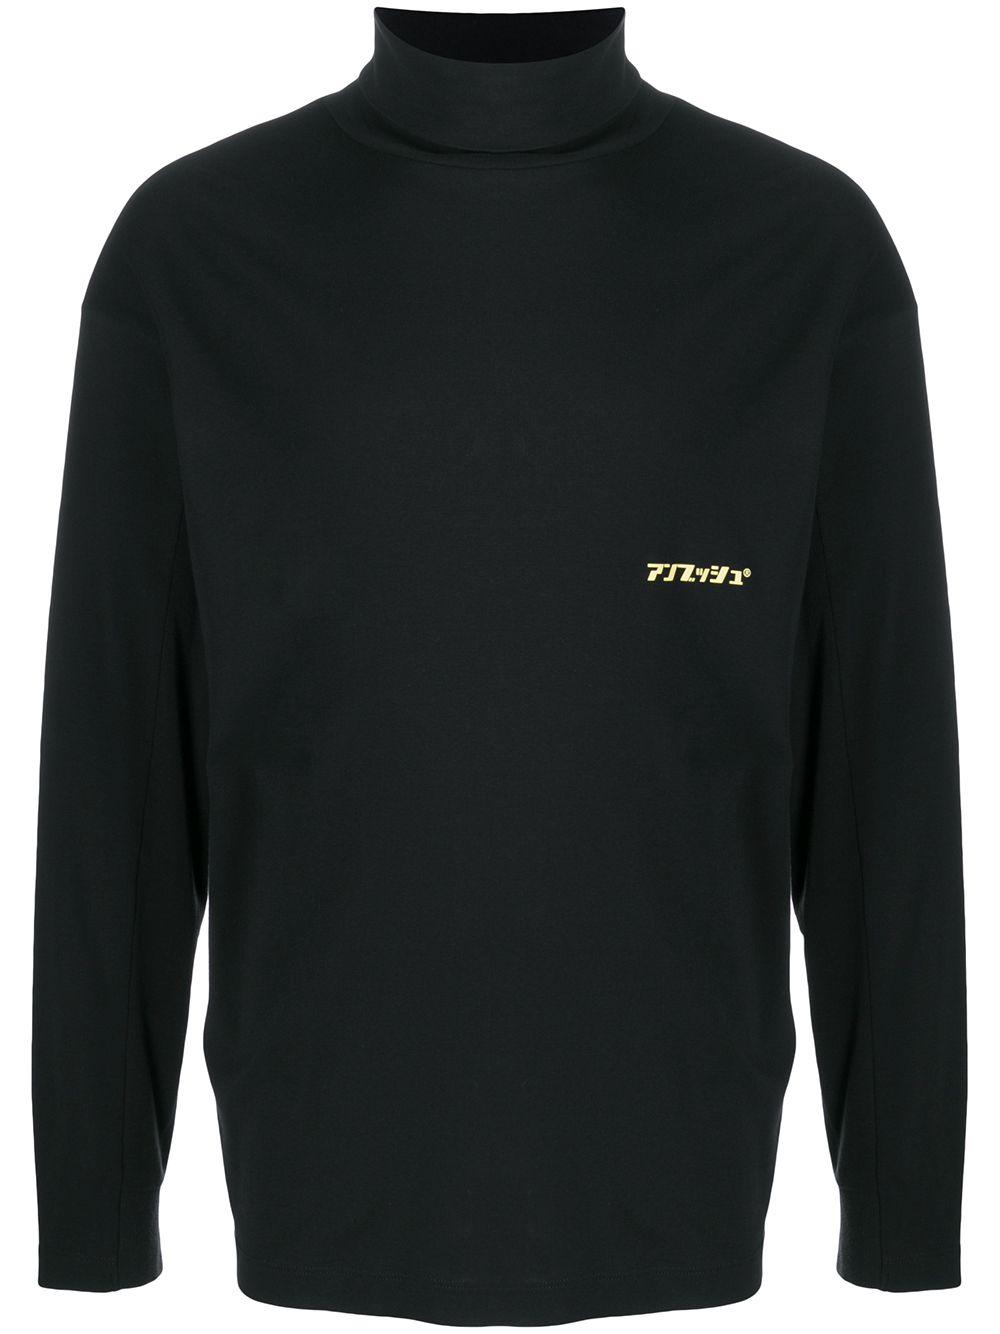 Cotton Turtle-neck Sweater